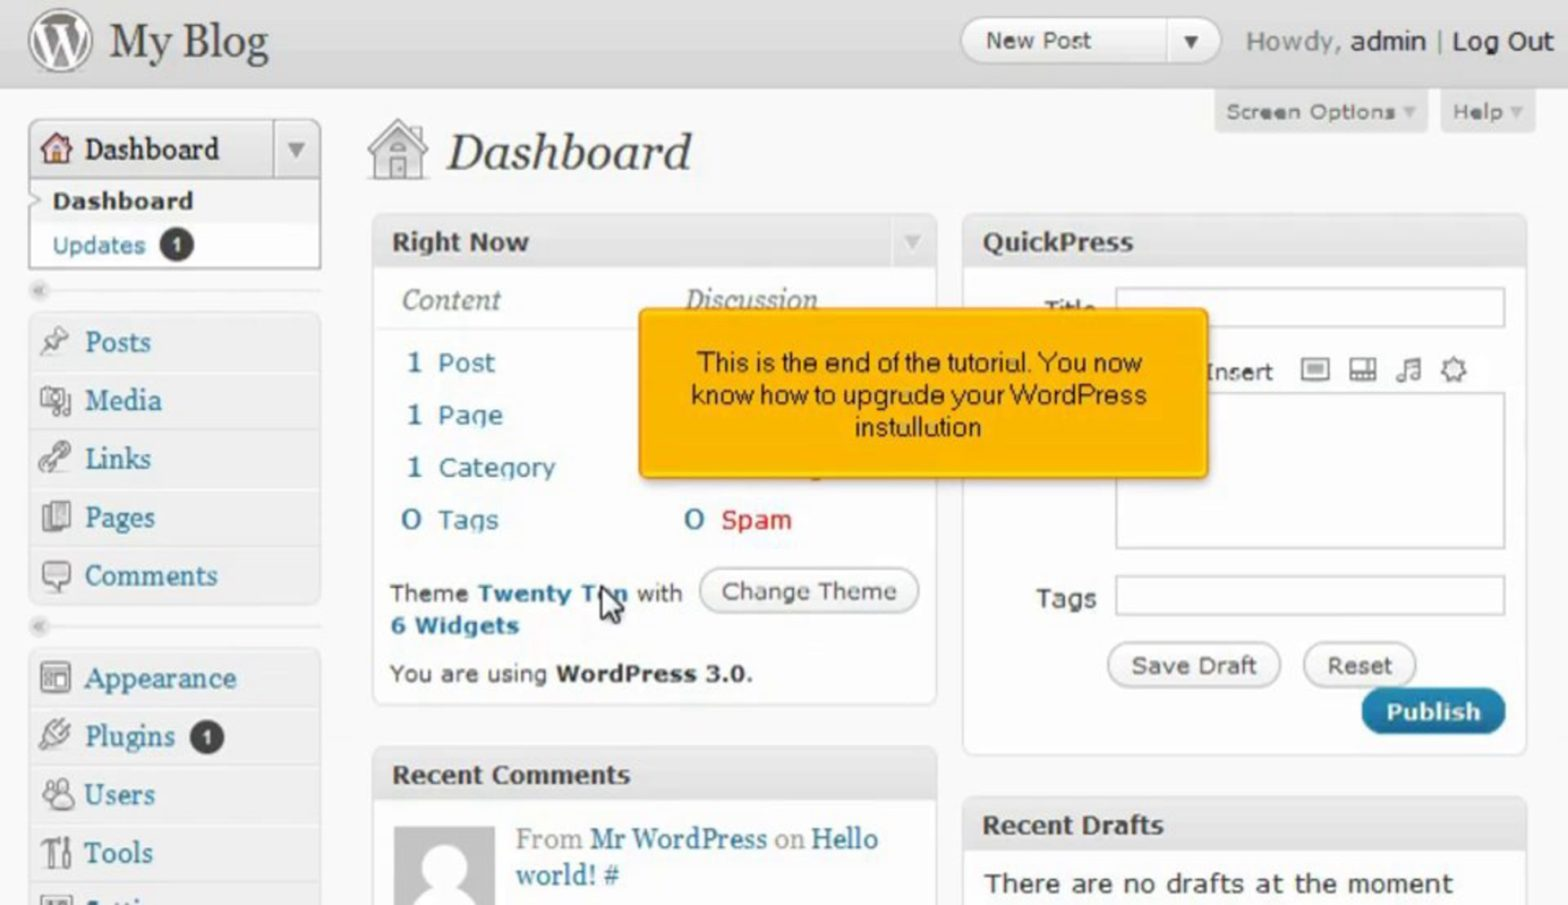 How to update your WordPress installation